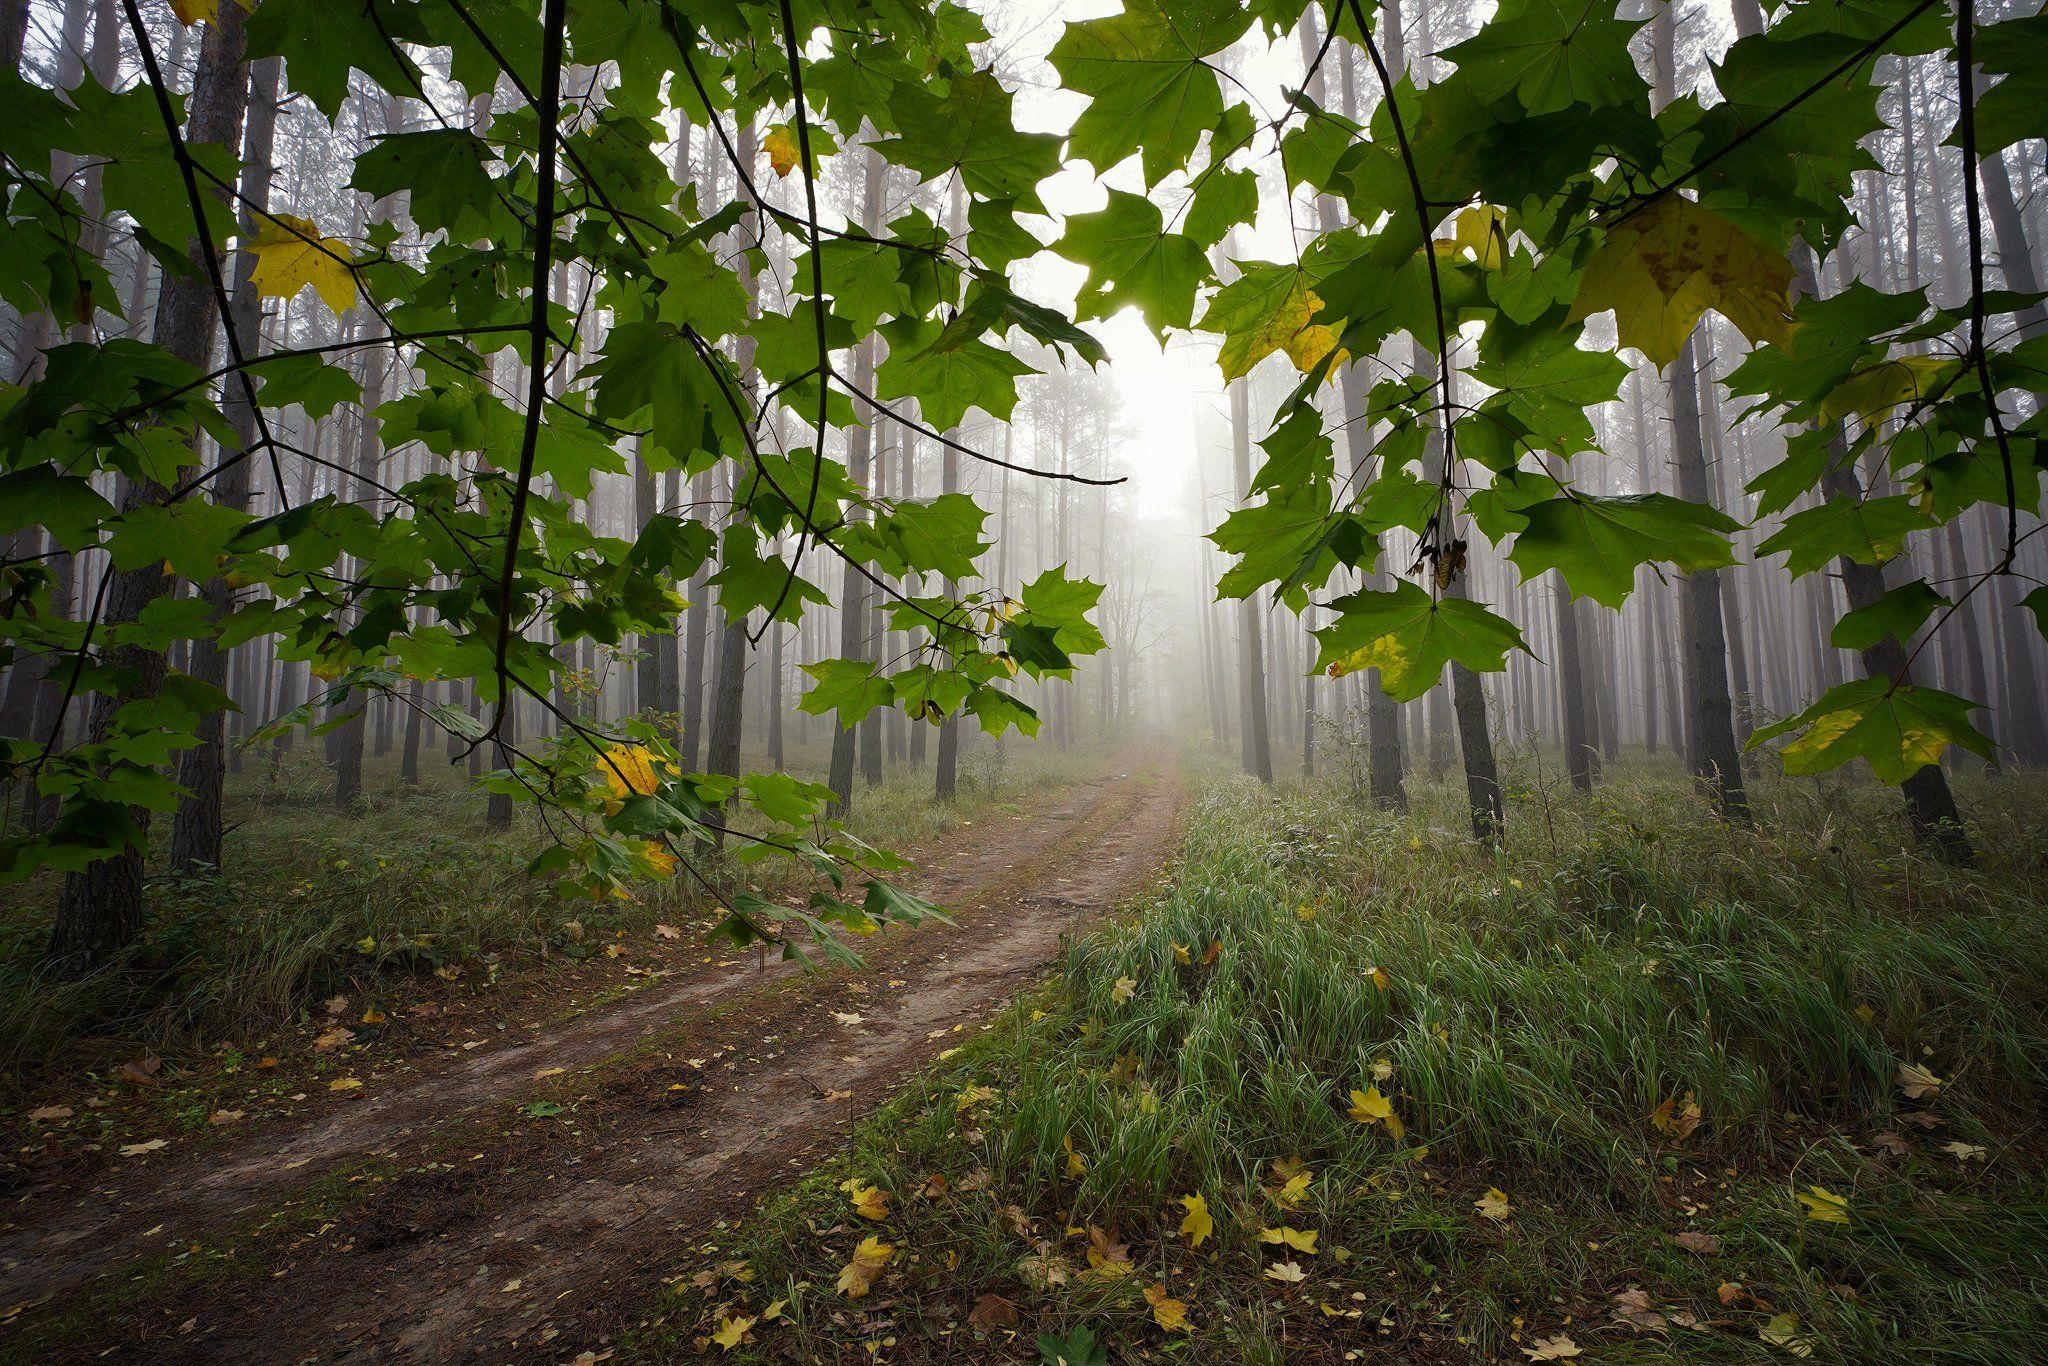 под кленом path road magic mist foggy morning trees forest wood nature naturallight tree green autumn las, Radoslaw Dranikowski